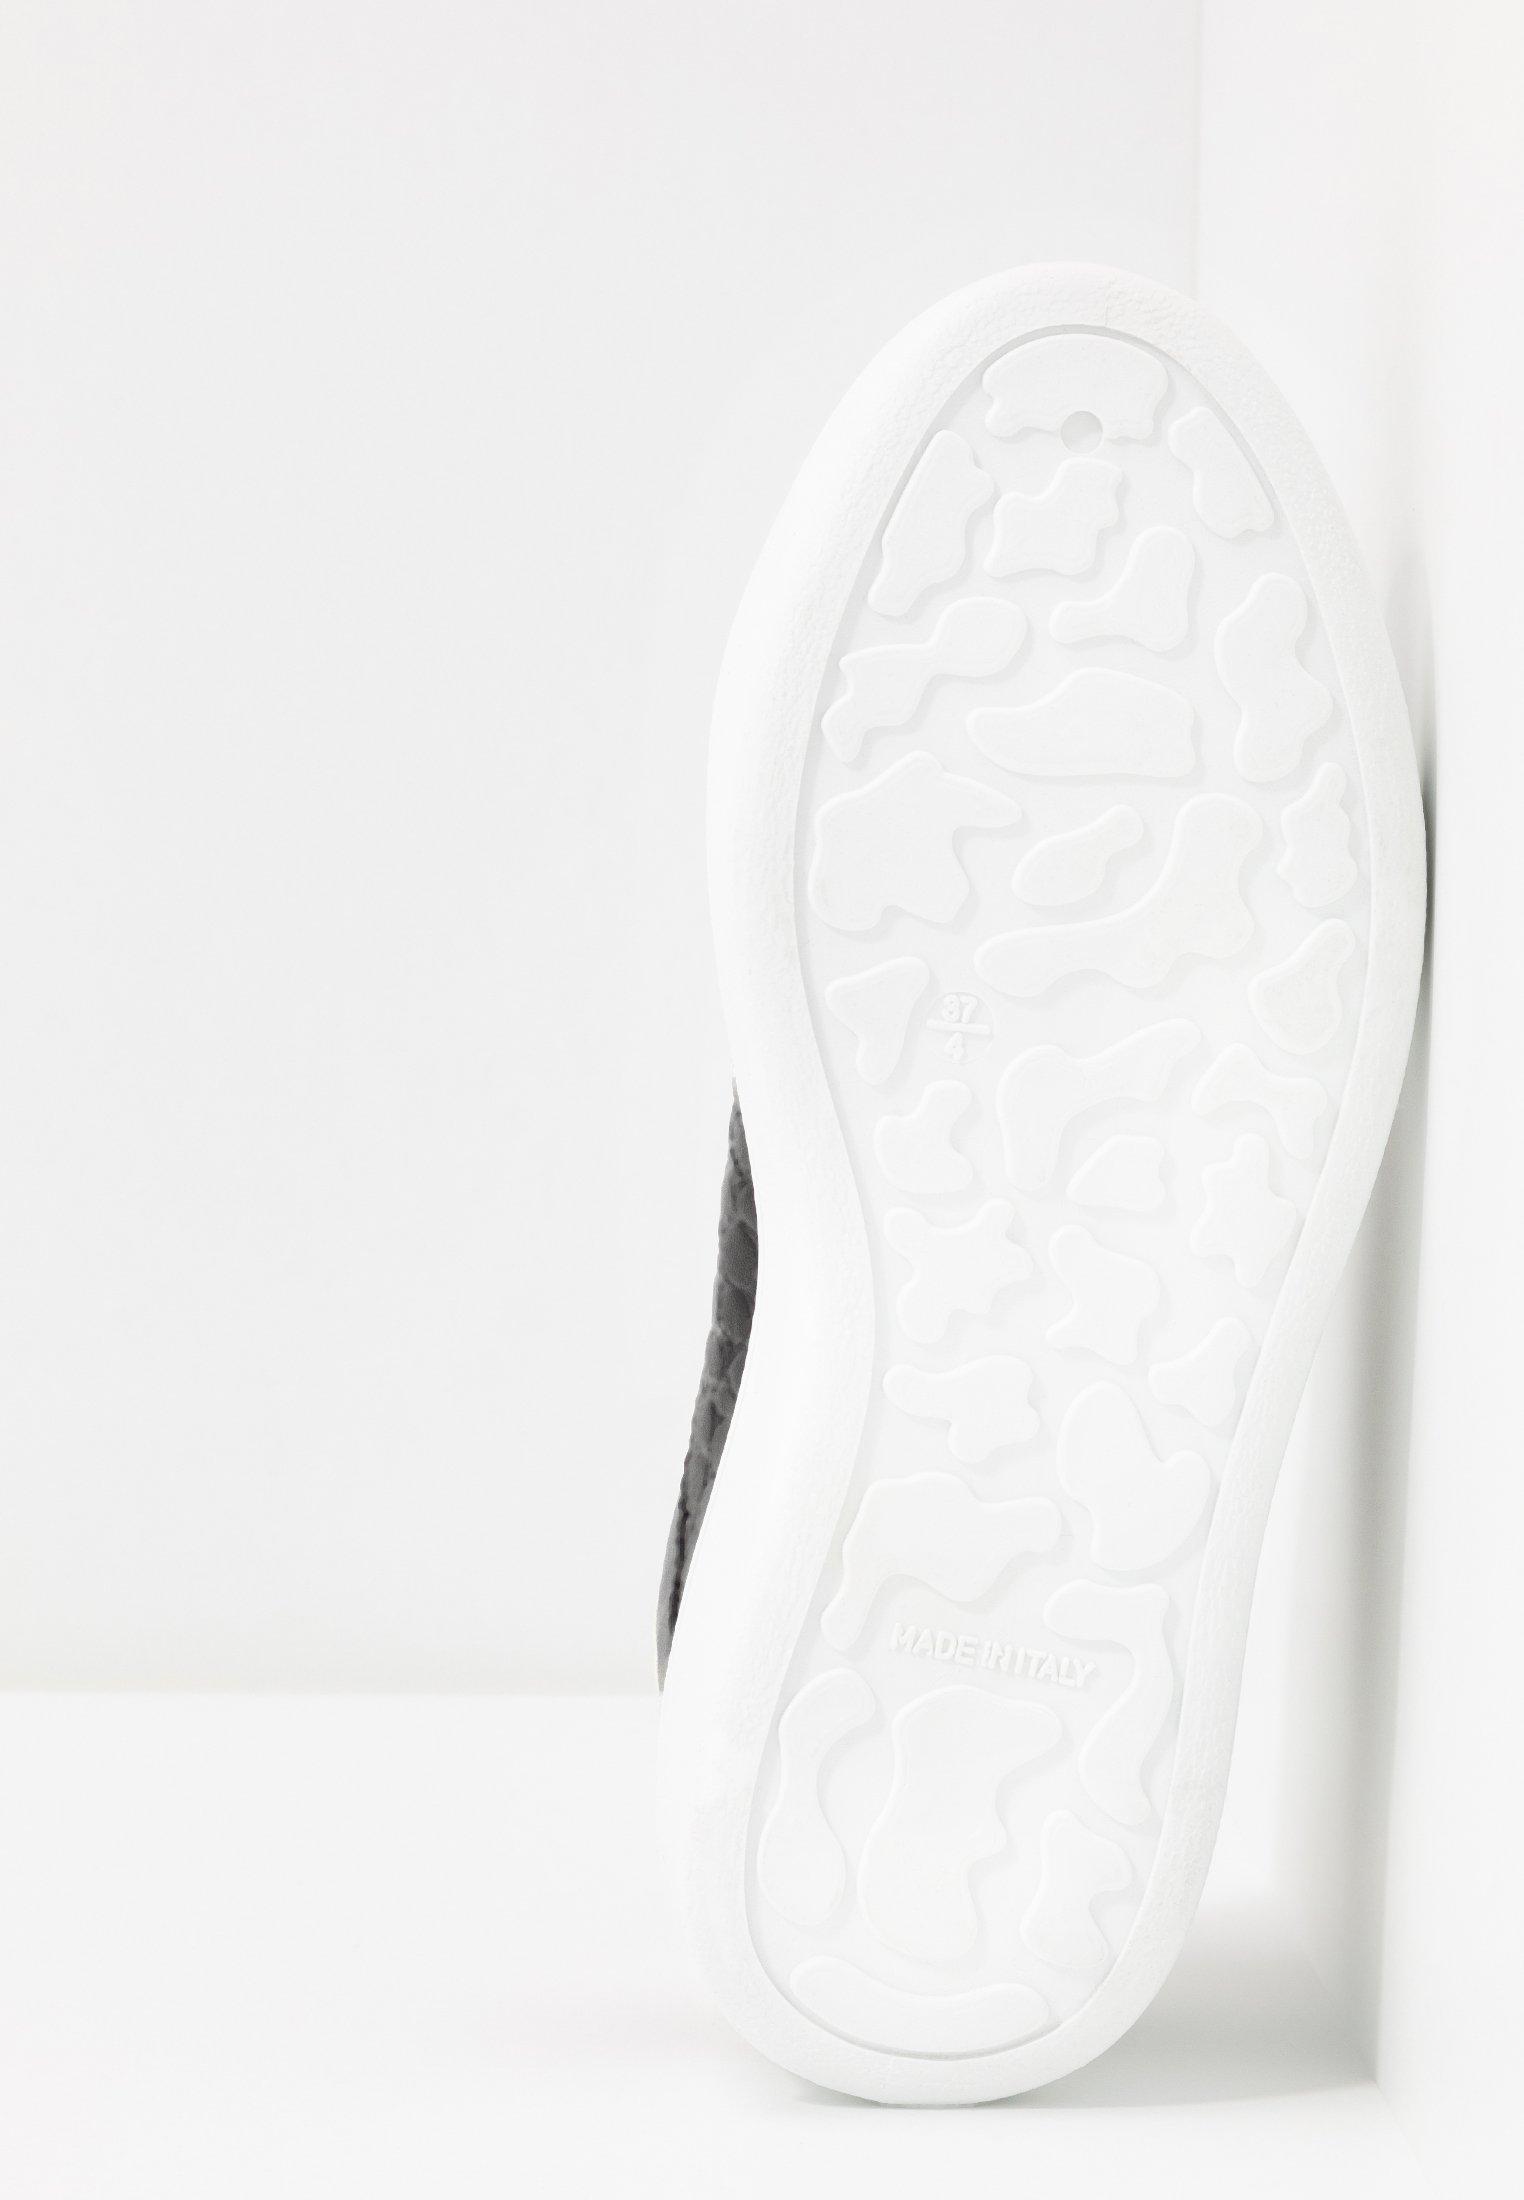 TrainerSneakers Basse white Cuba Black Topshop zVqUMGSp